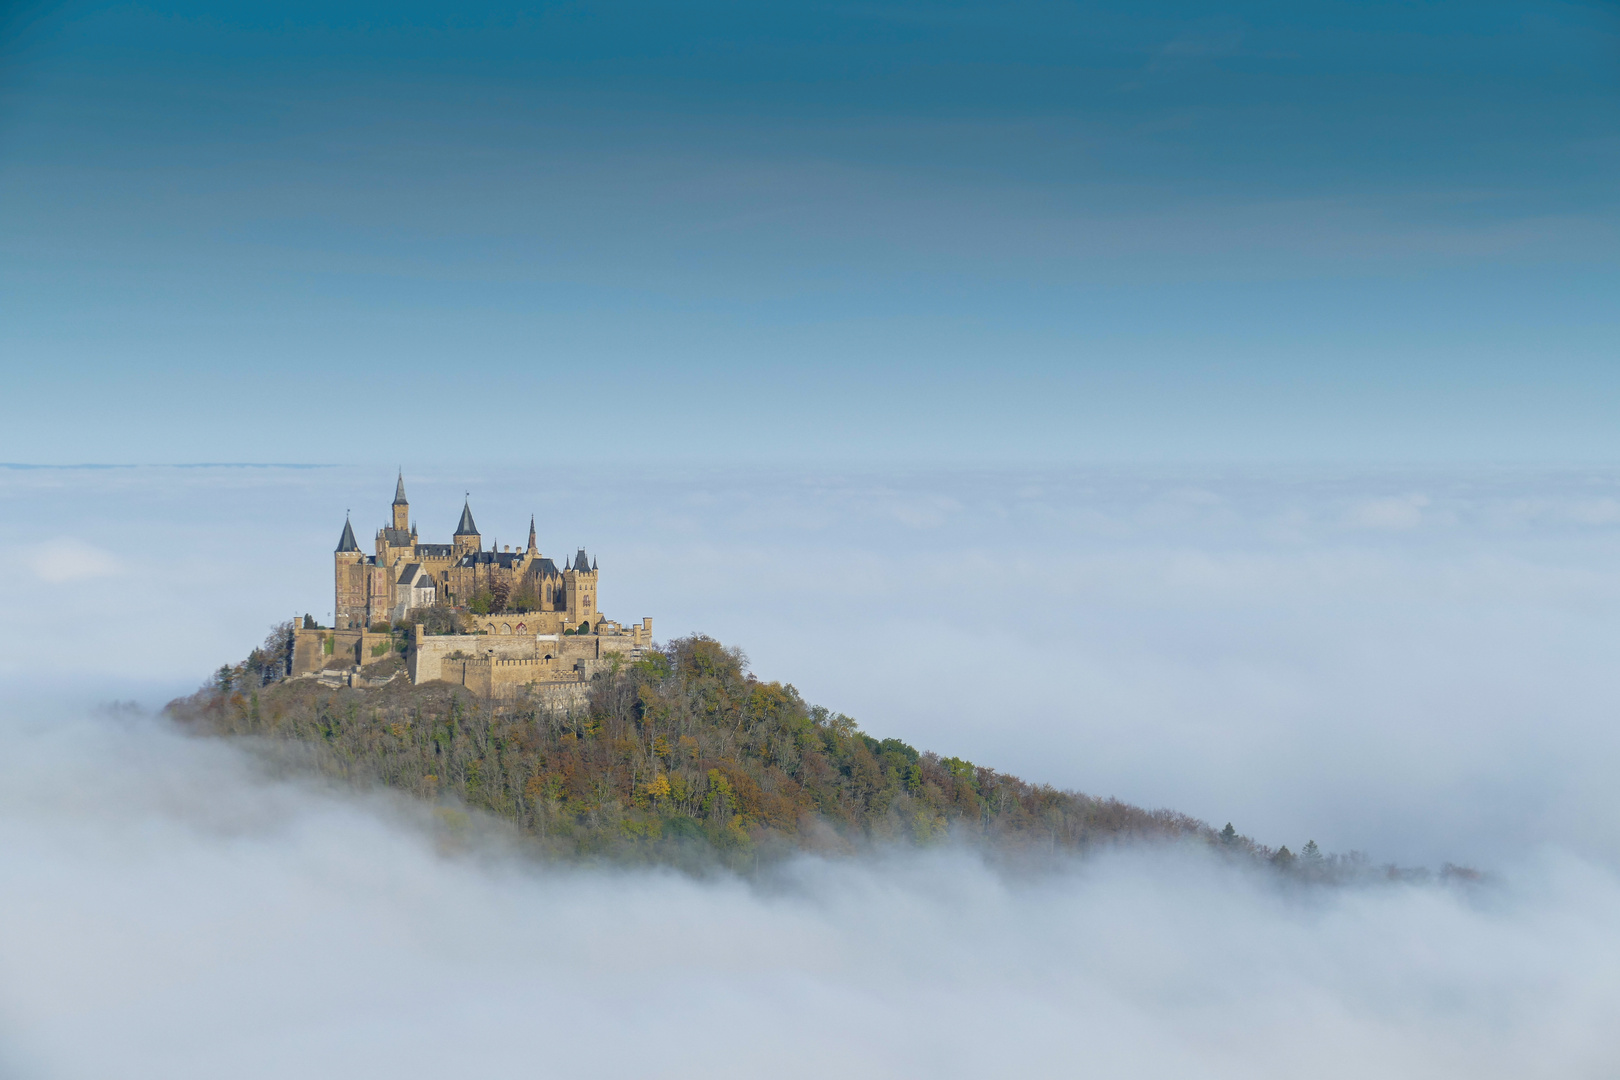 Die Burg Hohenzollern über dem Nebelmeer